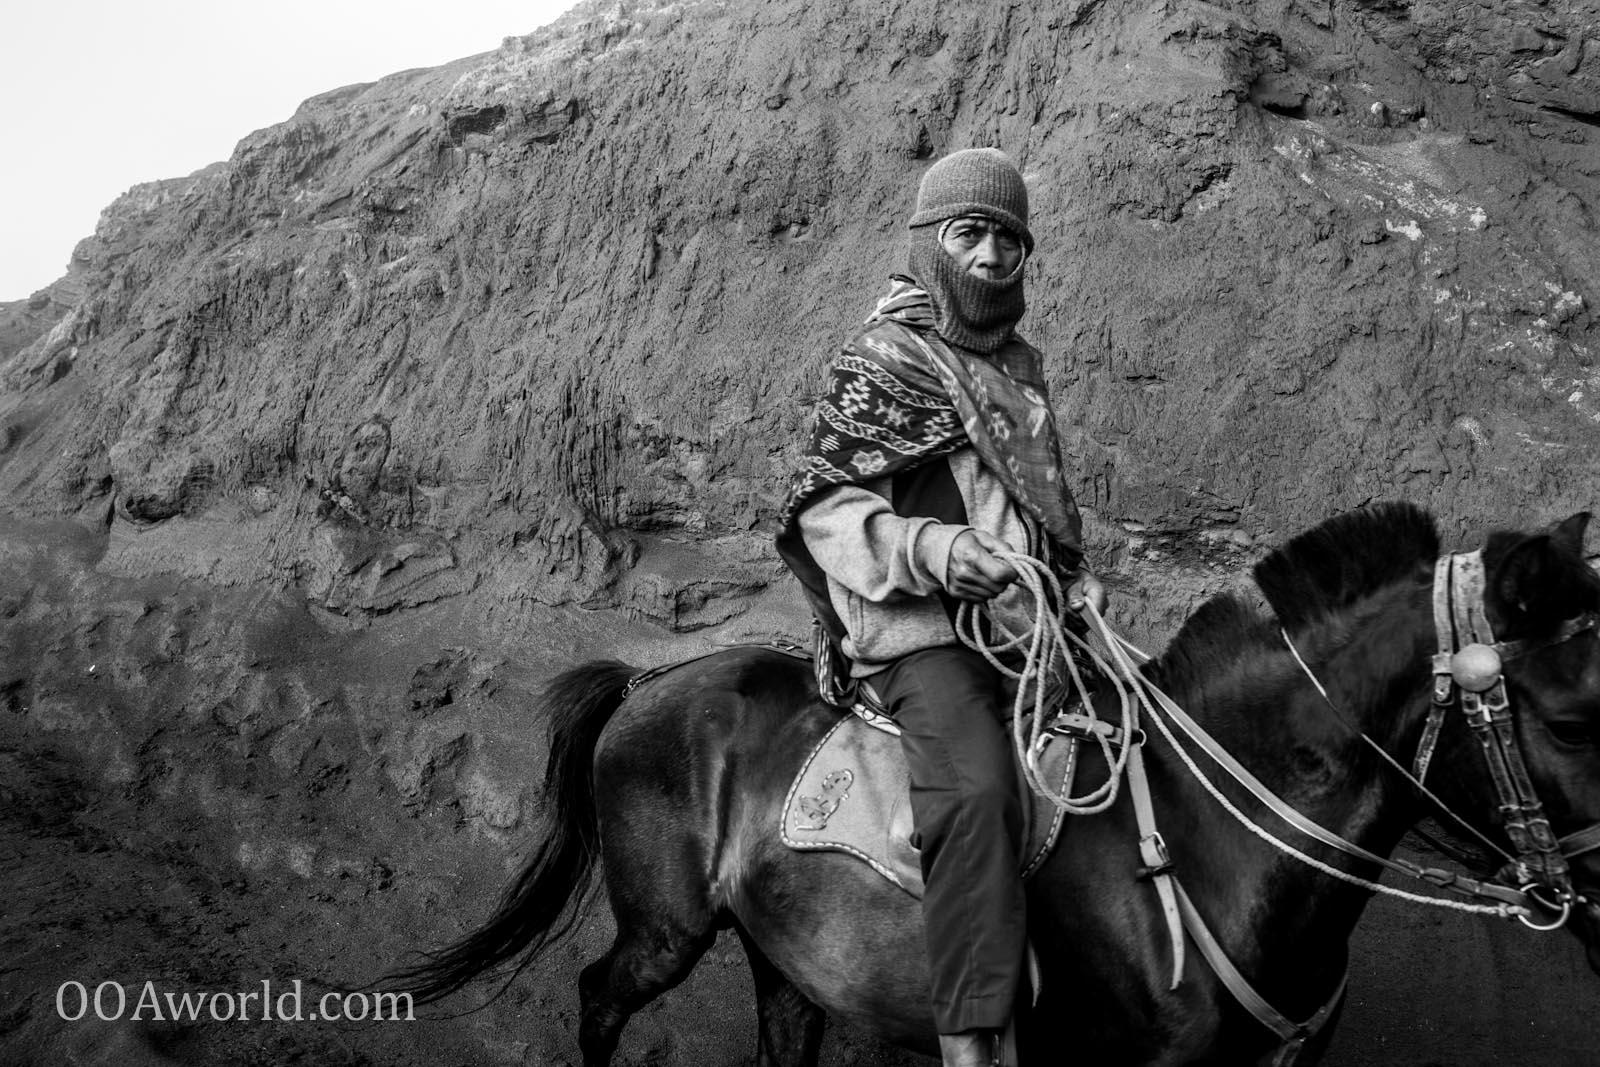 Photo Man Riding Horse Bromo Indonesia Ooaworld